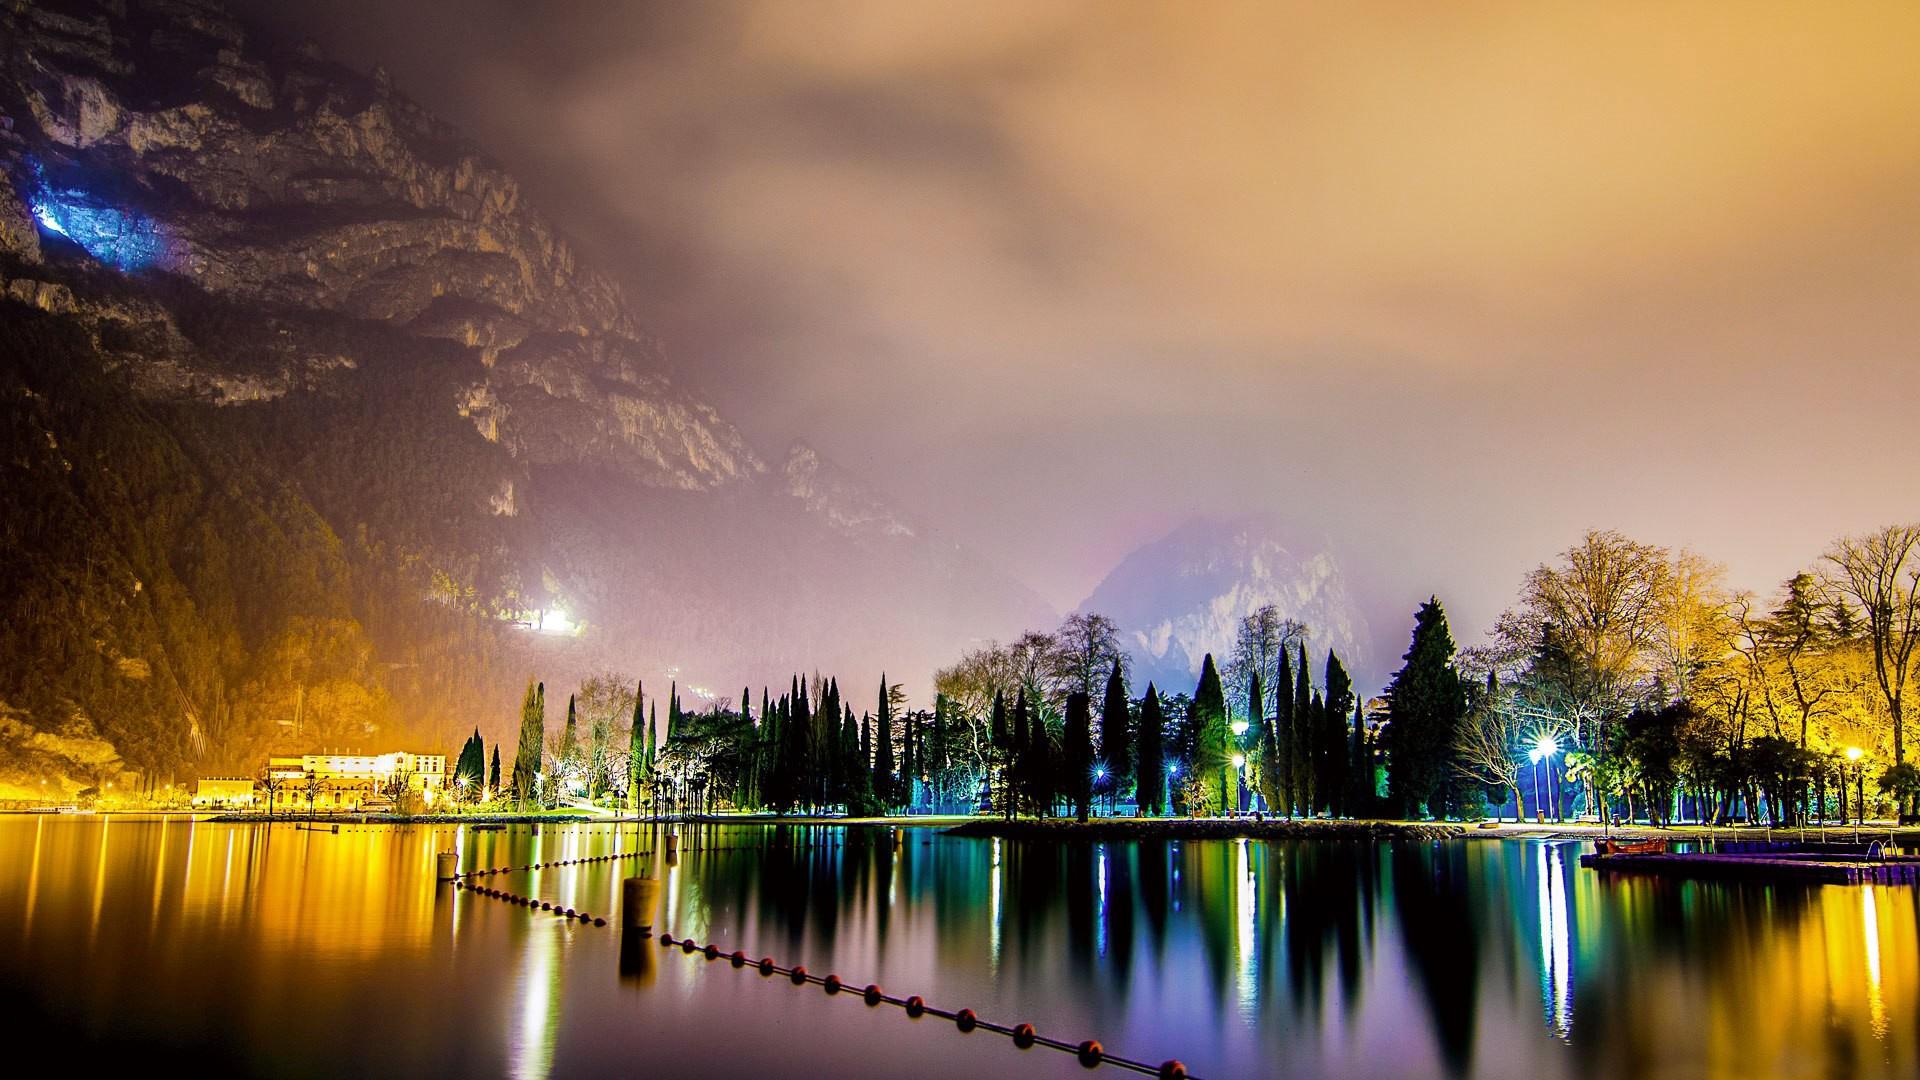 live lock screen wallpaper,sky,nature,reflection,water,natural landscape